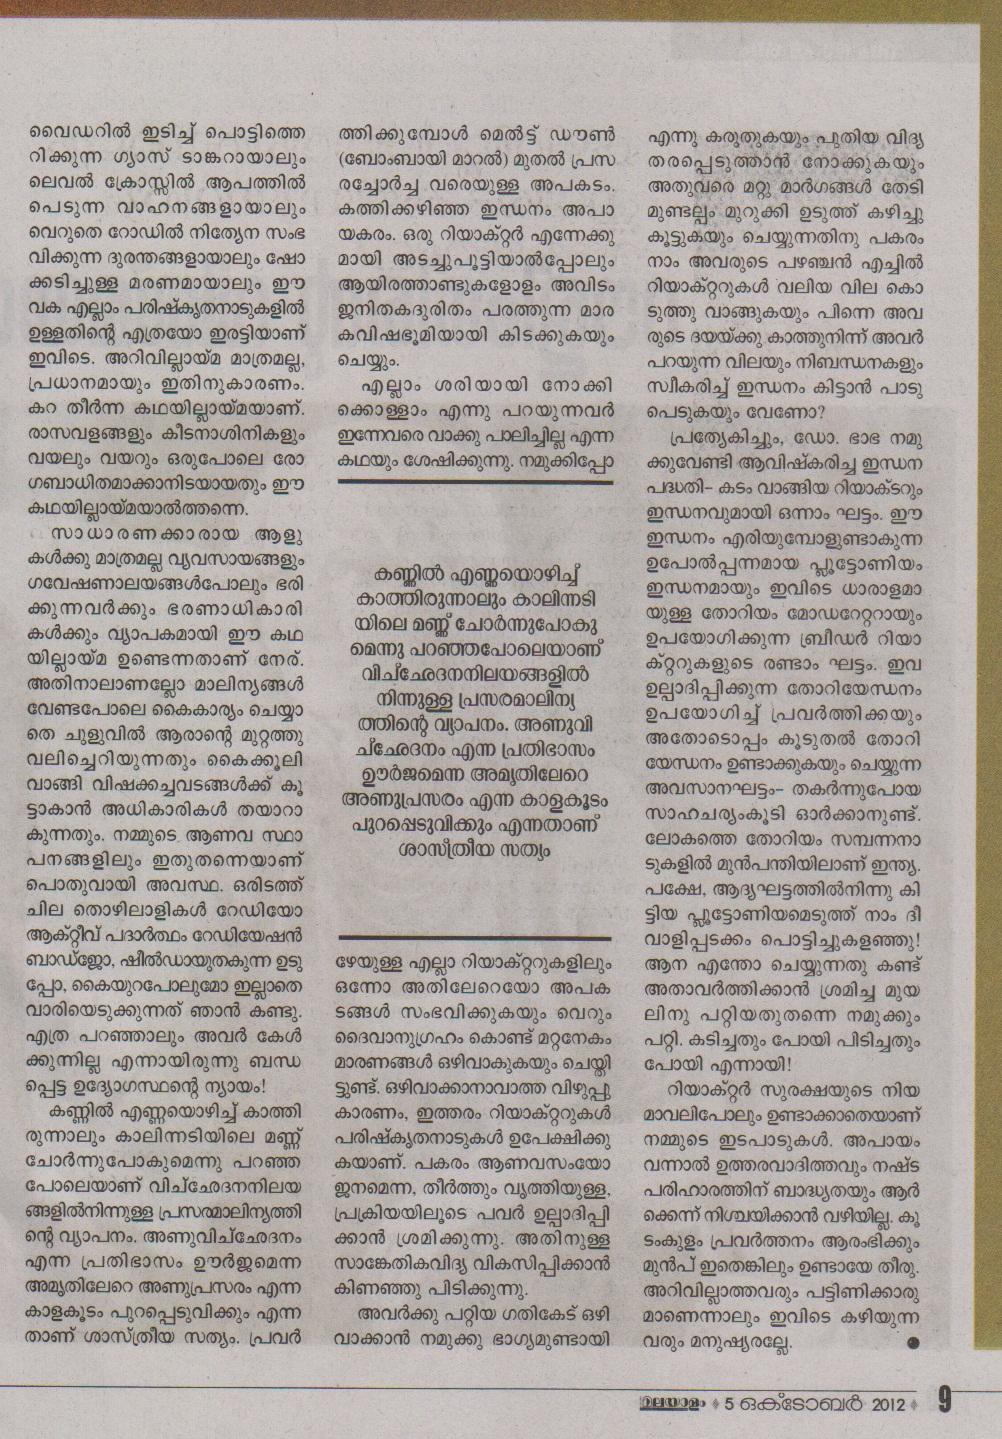 Resume Templates Kerala Kaumudi Plus Malayalam / India S Covid 19 Count Crosses 50 000 Mark Mumbai Records Over 10 000 Cases India General Kerala ...